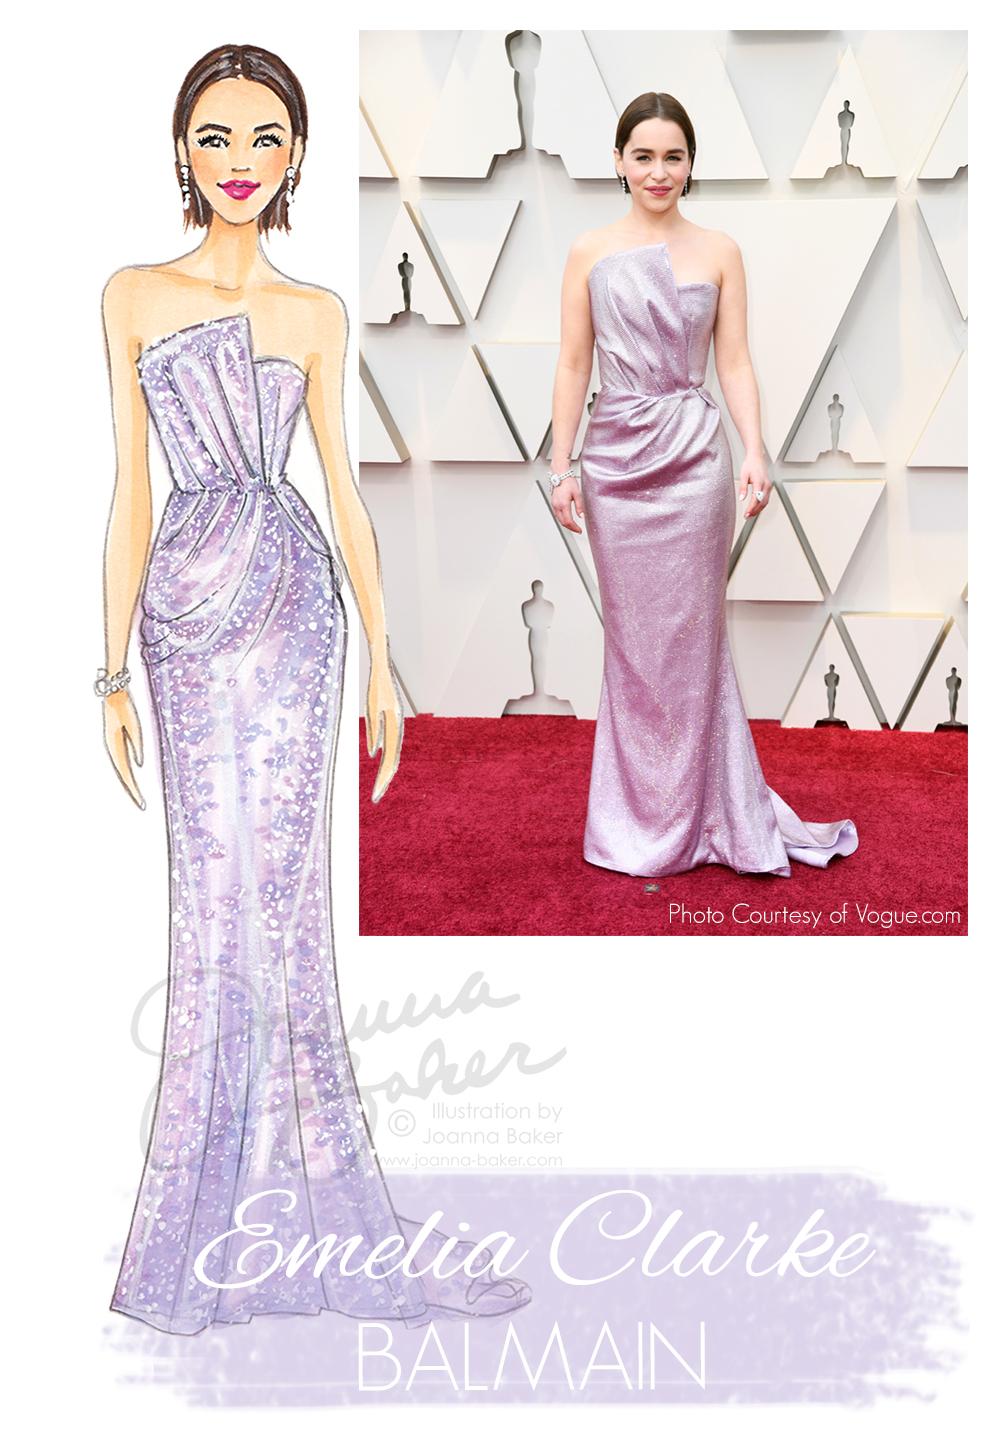 Emelia Clarke Oscars 2019 Red Carpet Fashion Illustration by Joanna Baker